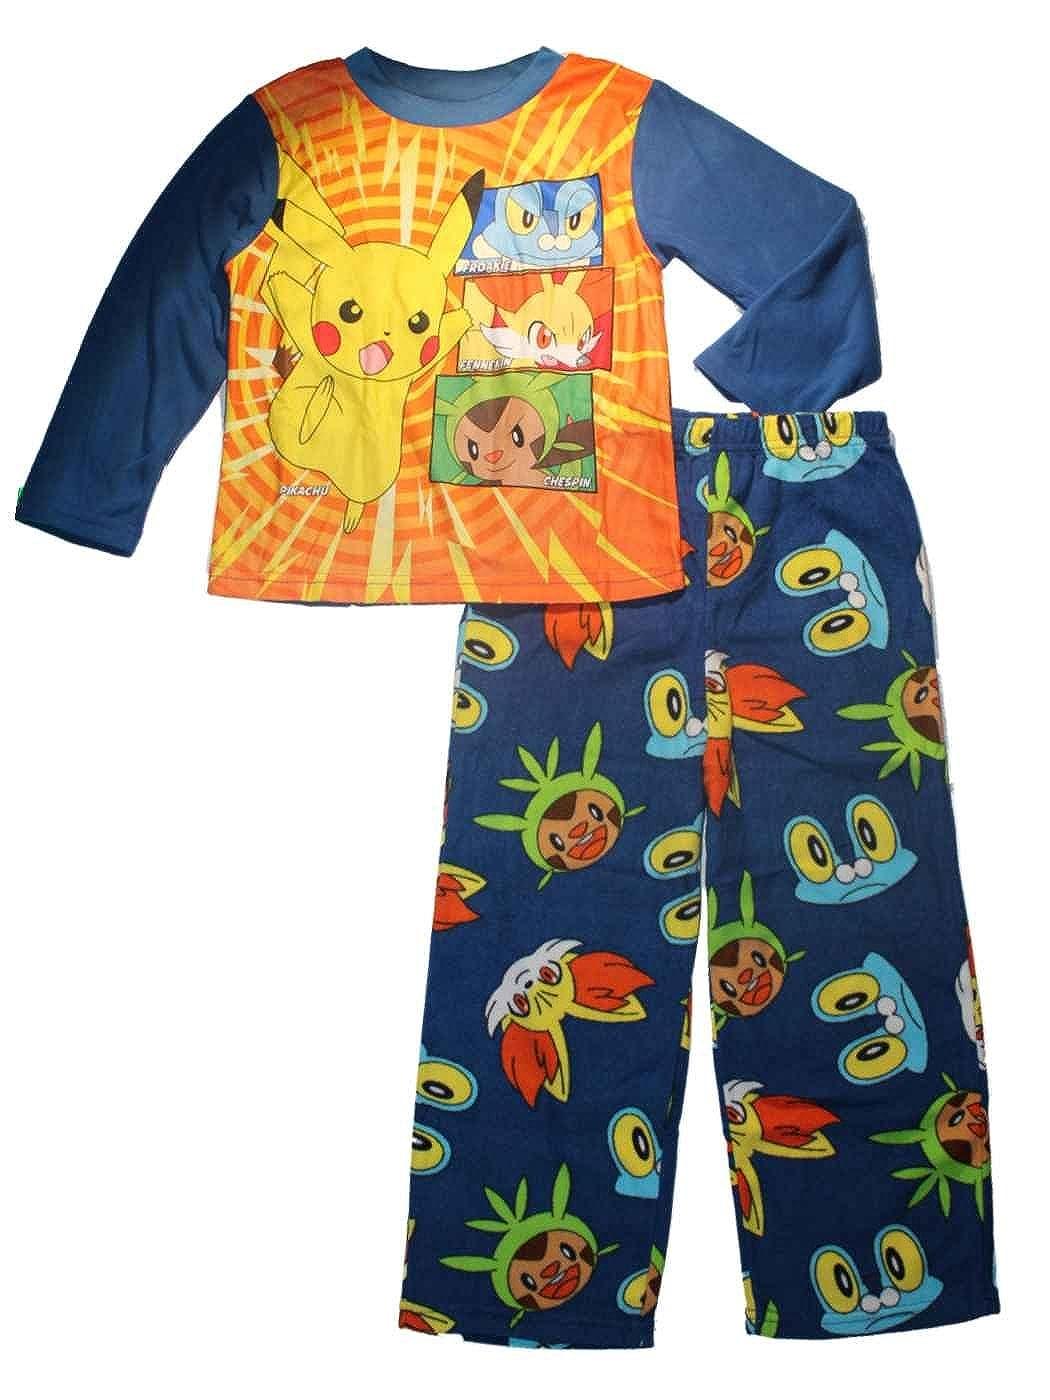 Boys Pyjamas Pokemon Pjs Catch /'em All Pikachu Ash Chespin Black 4 to 6 Years